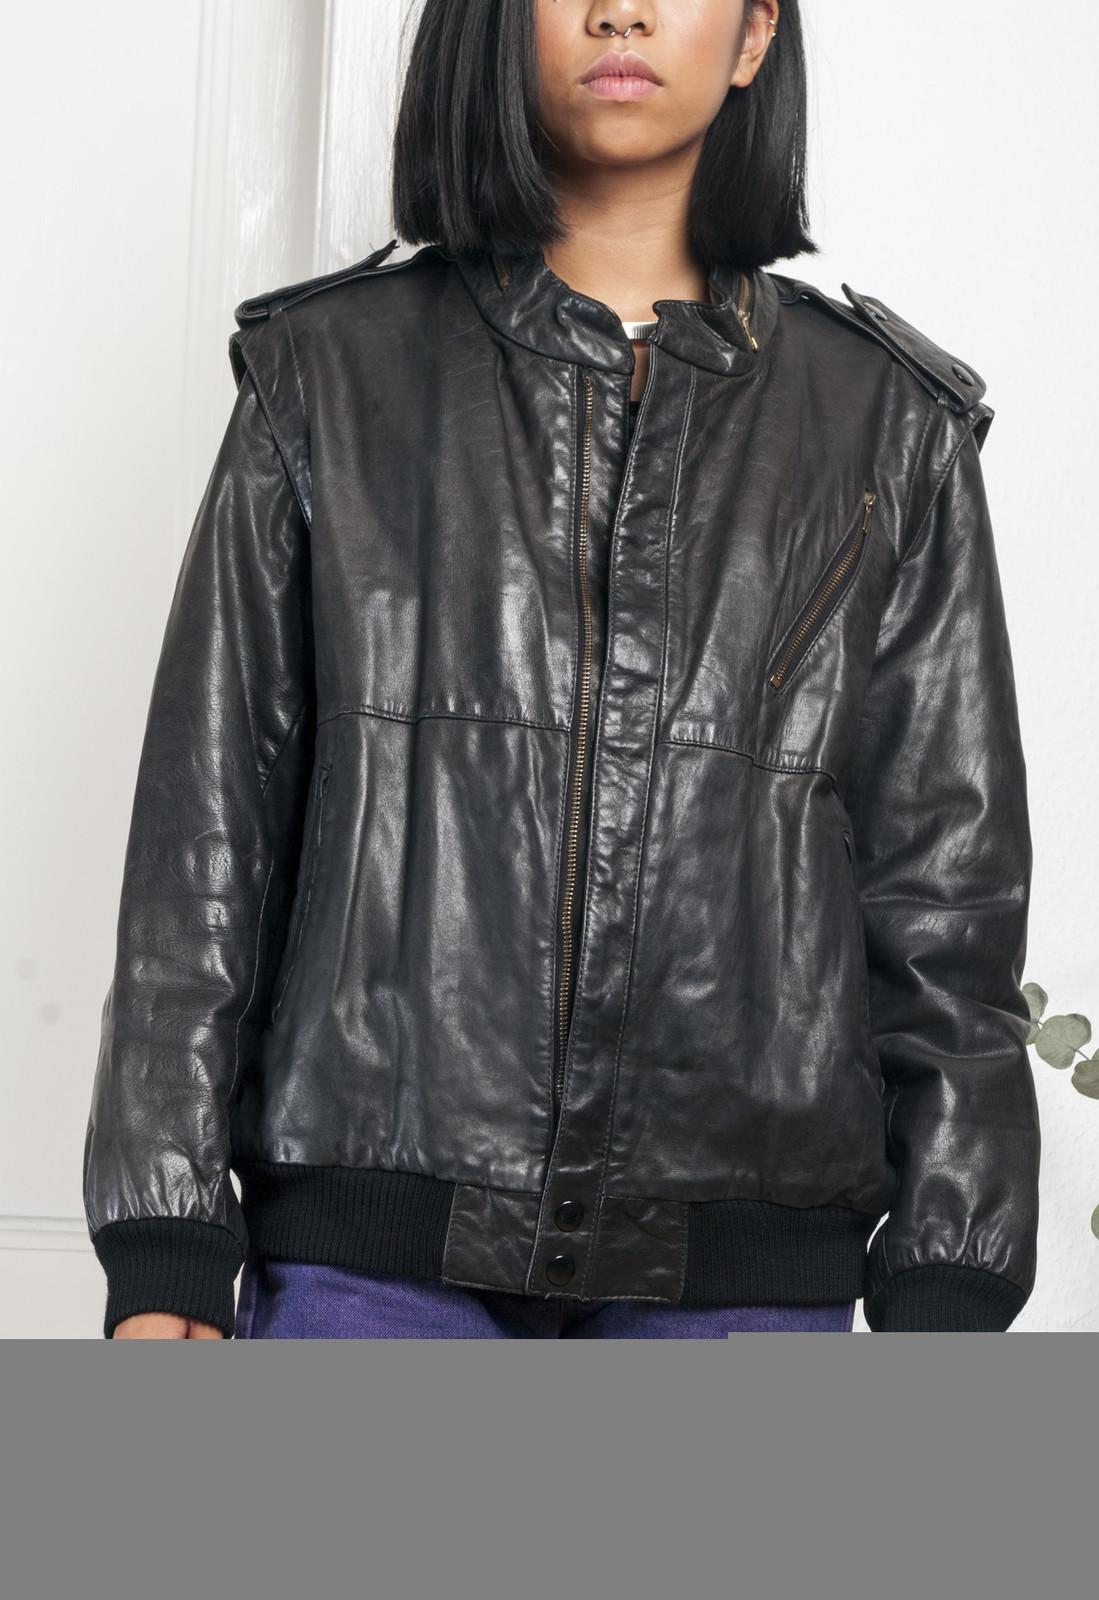 80s vintage leather bomber jacket